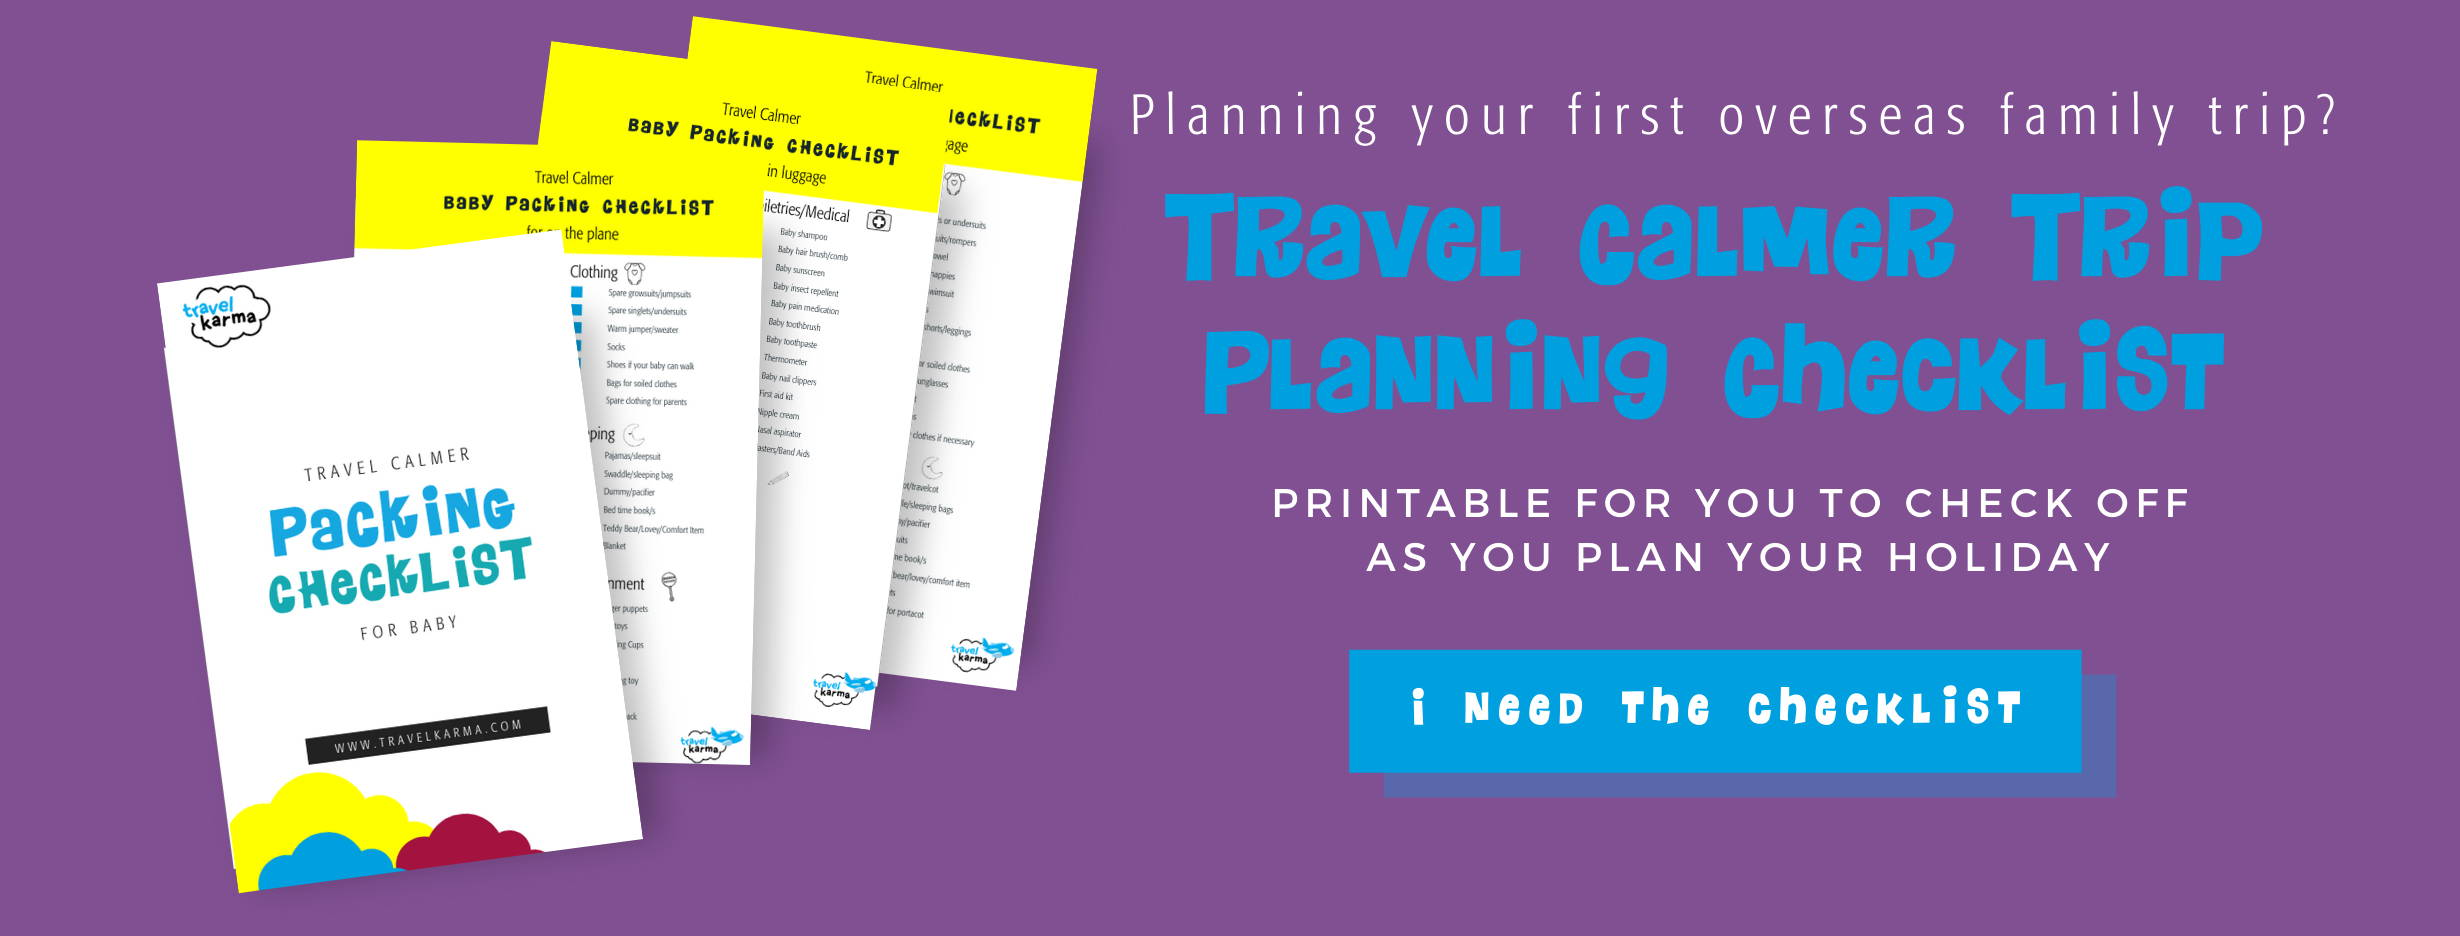 Travel calmer packing checklist for family trip